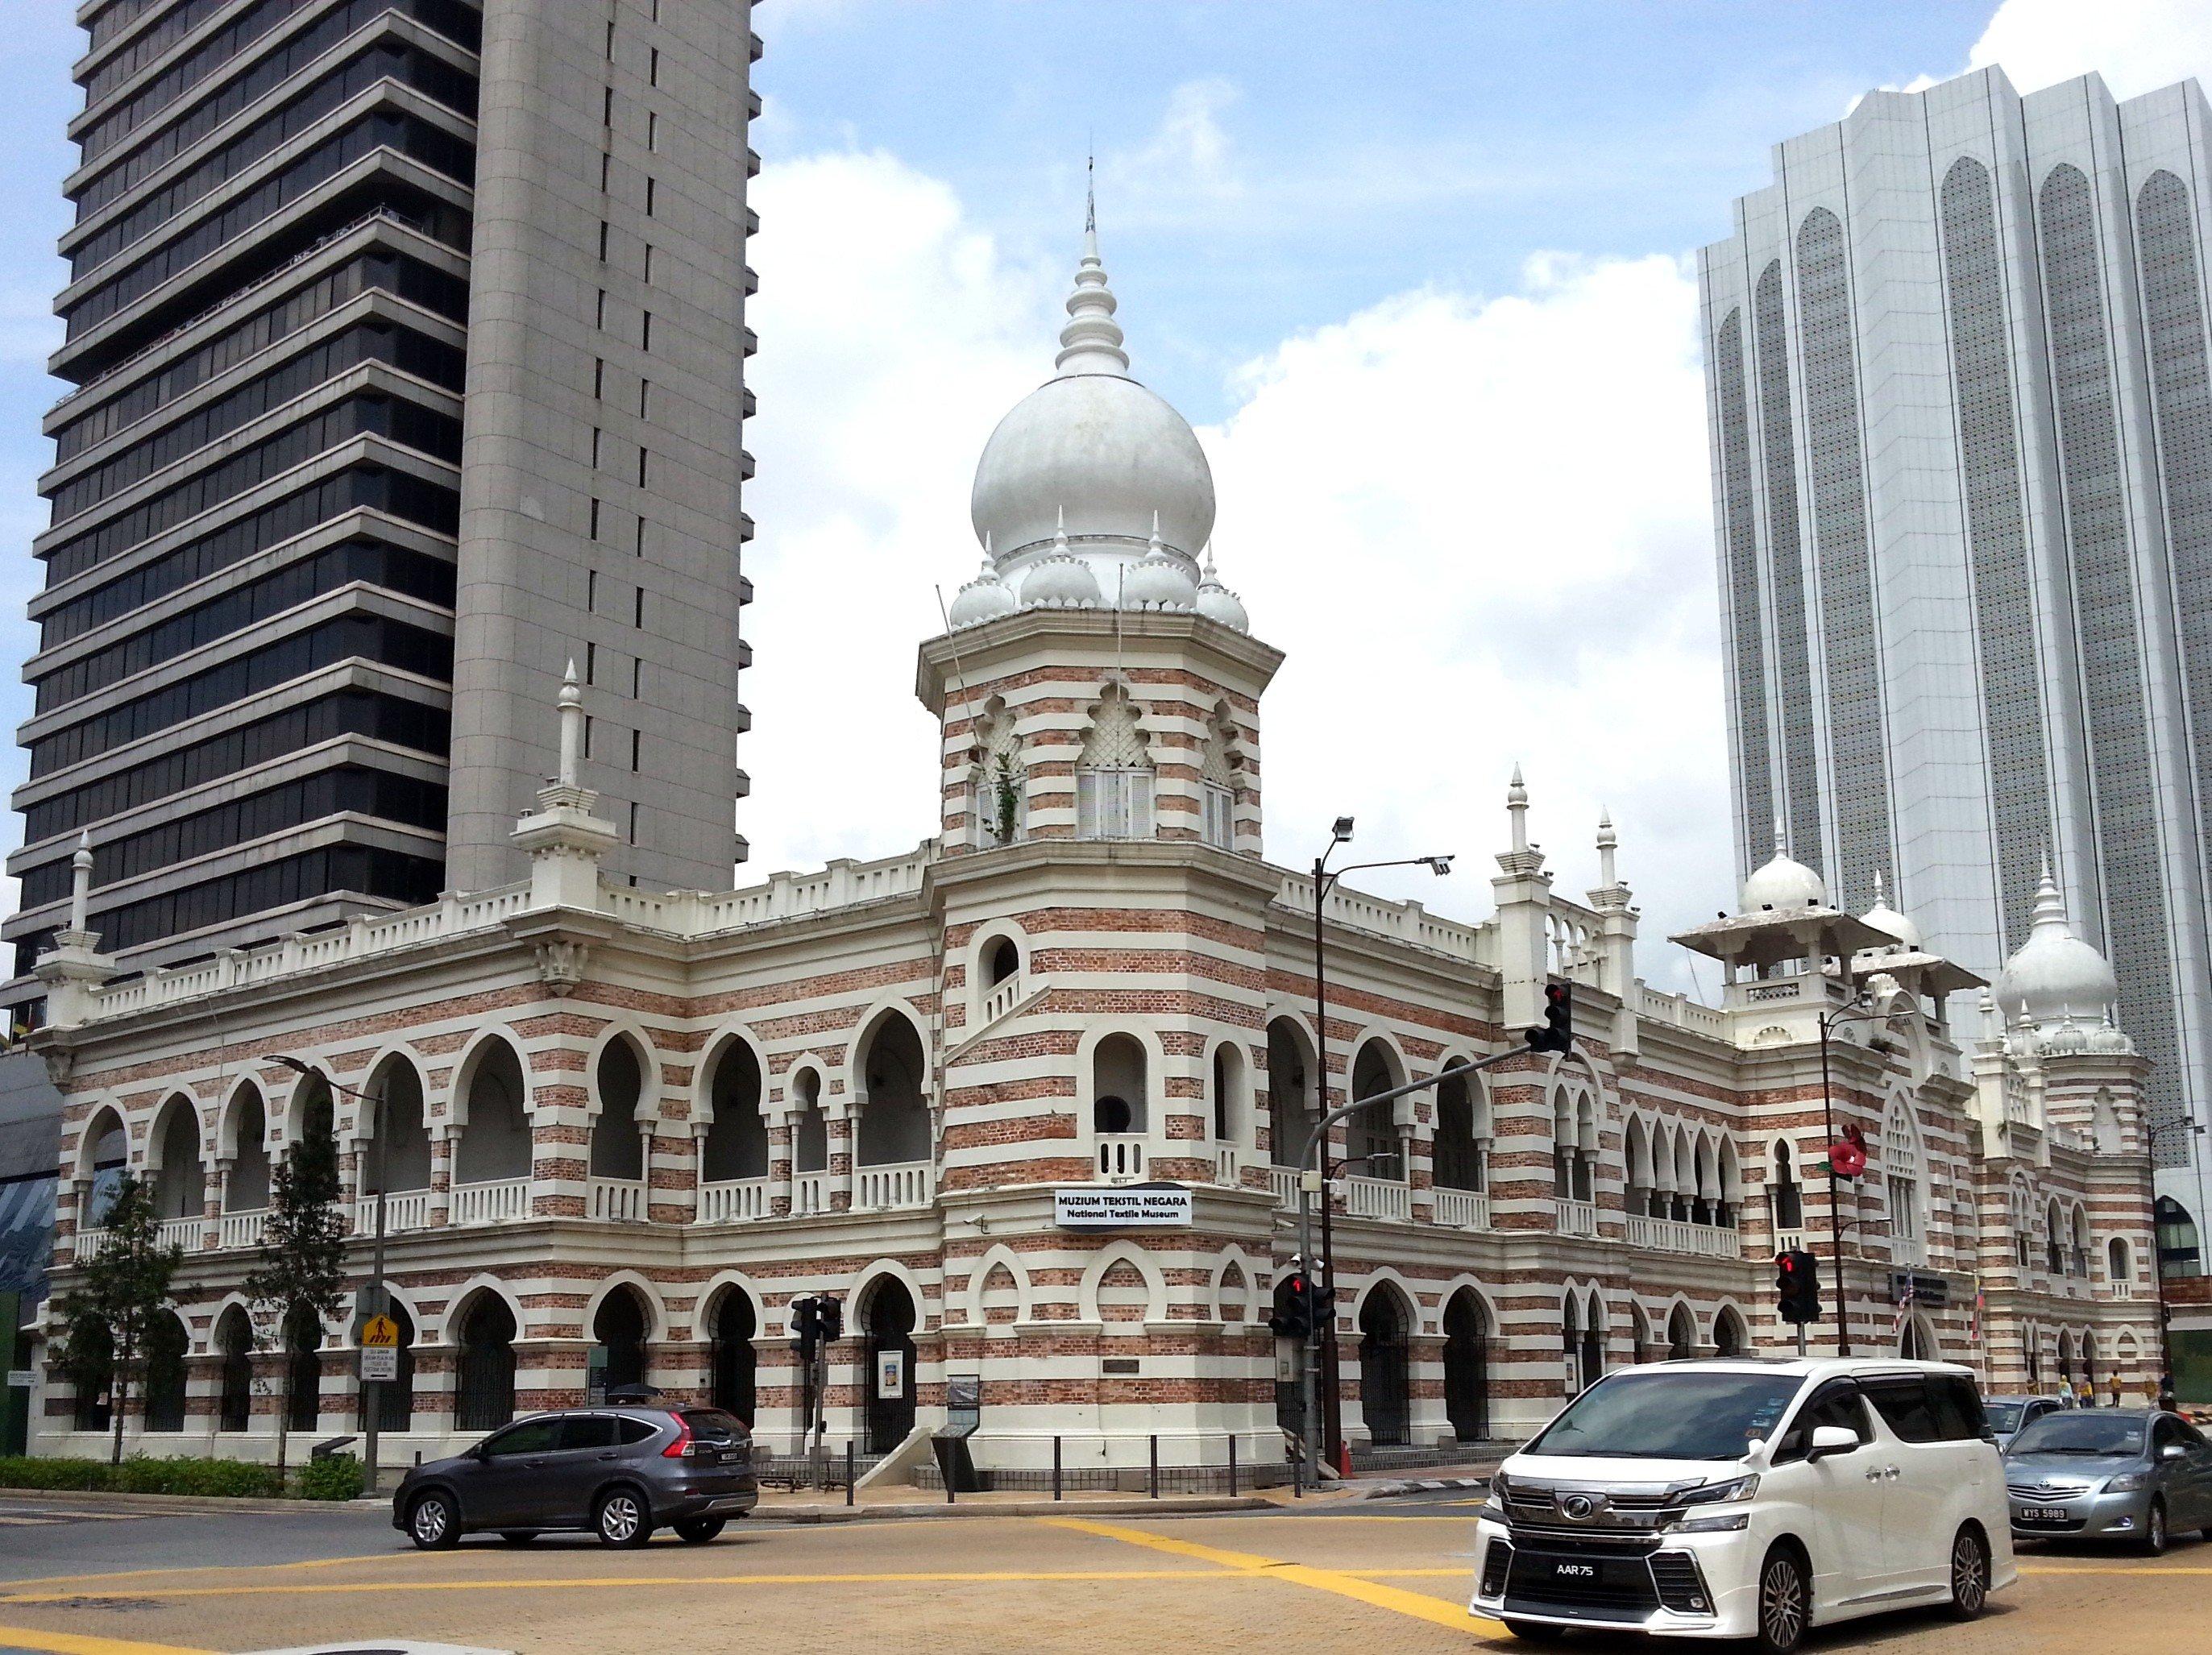 National Textile Museum in Kuala Lumpur